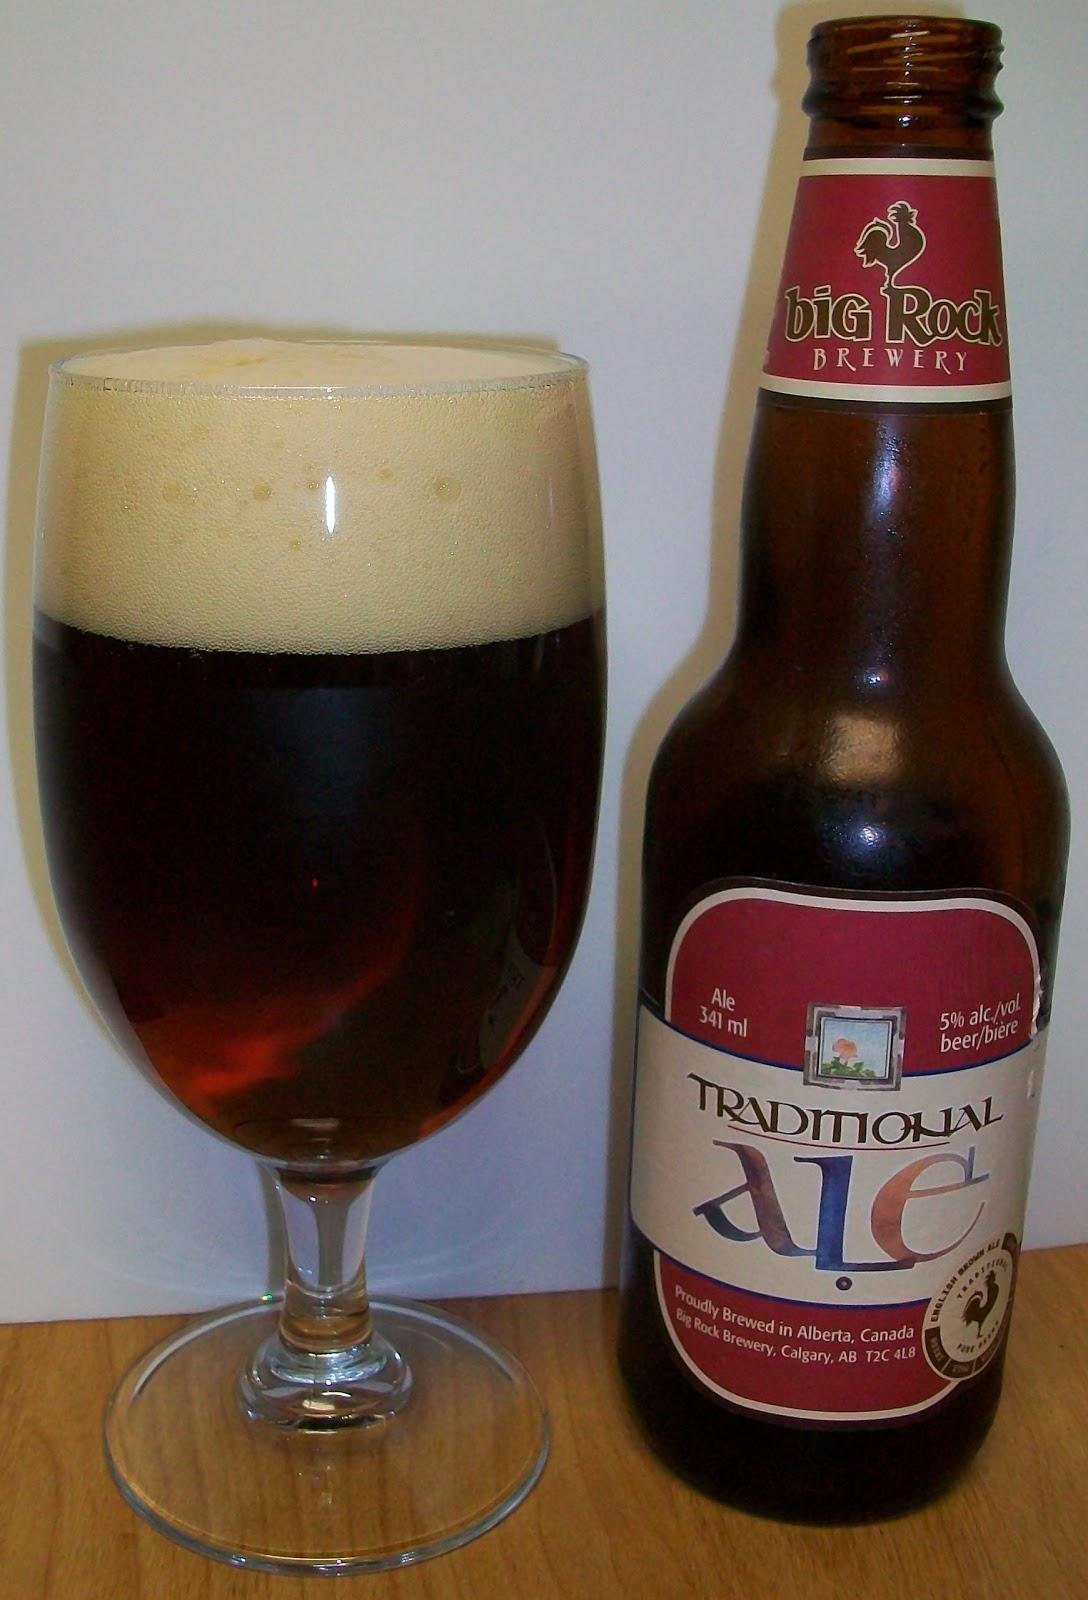 John's Bier Blog: Big Rock Traditional Ale